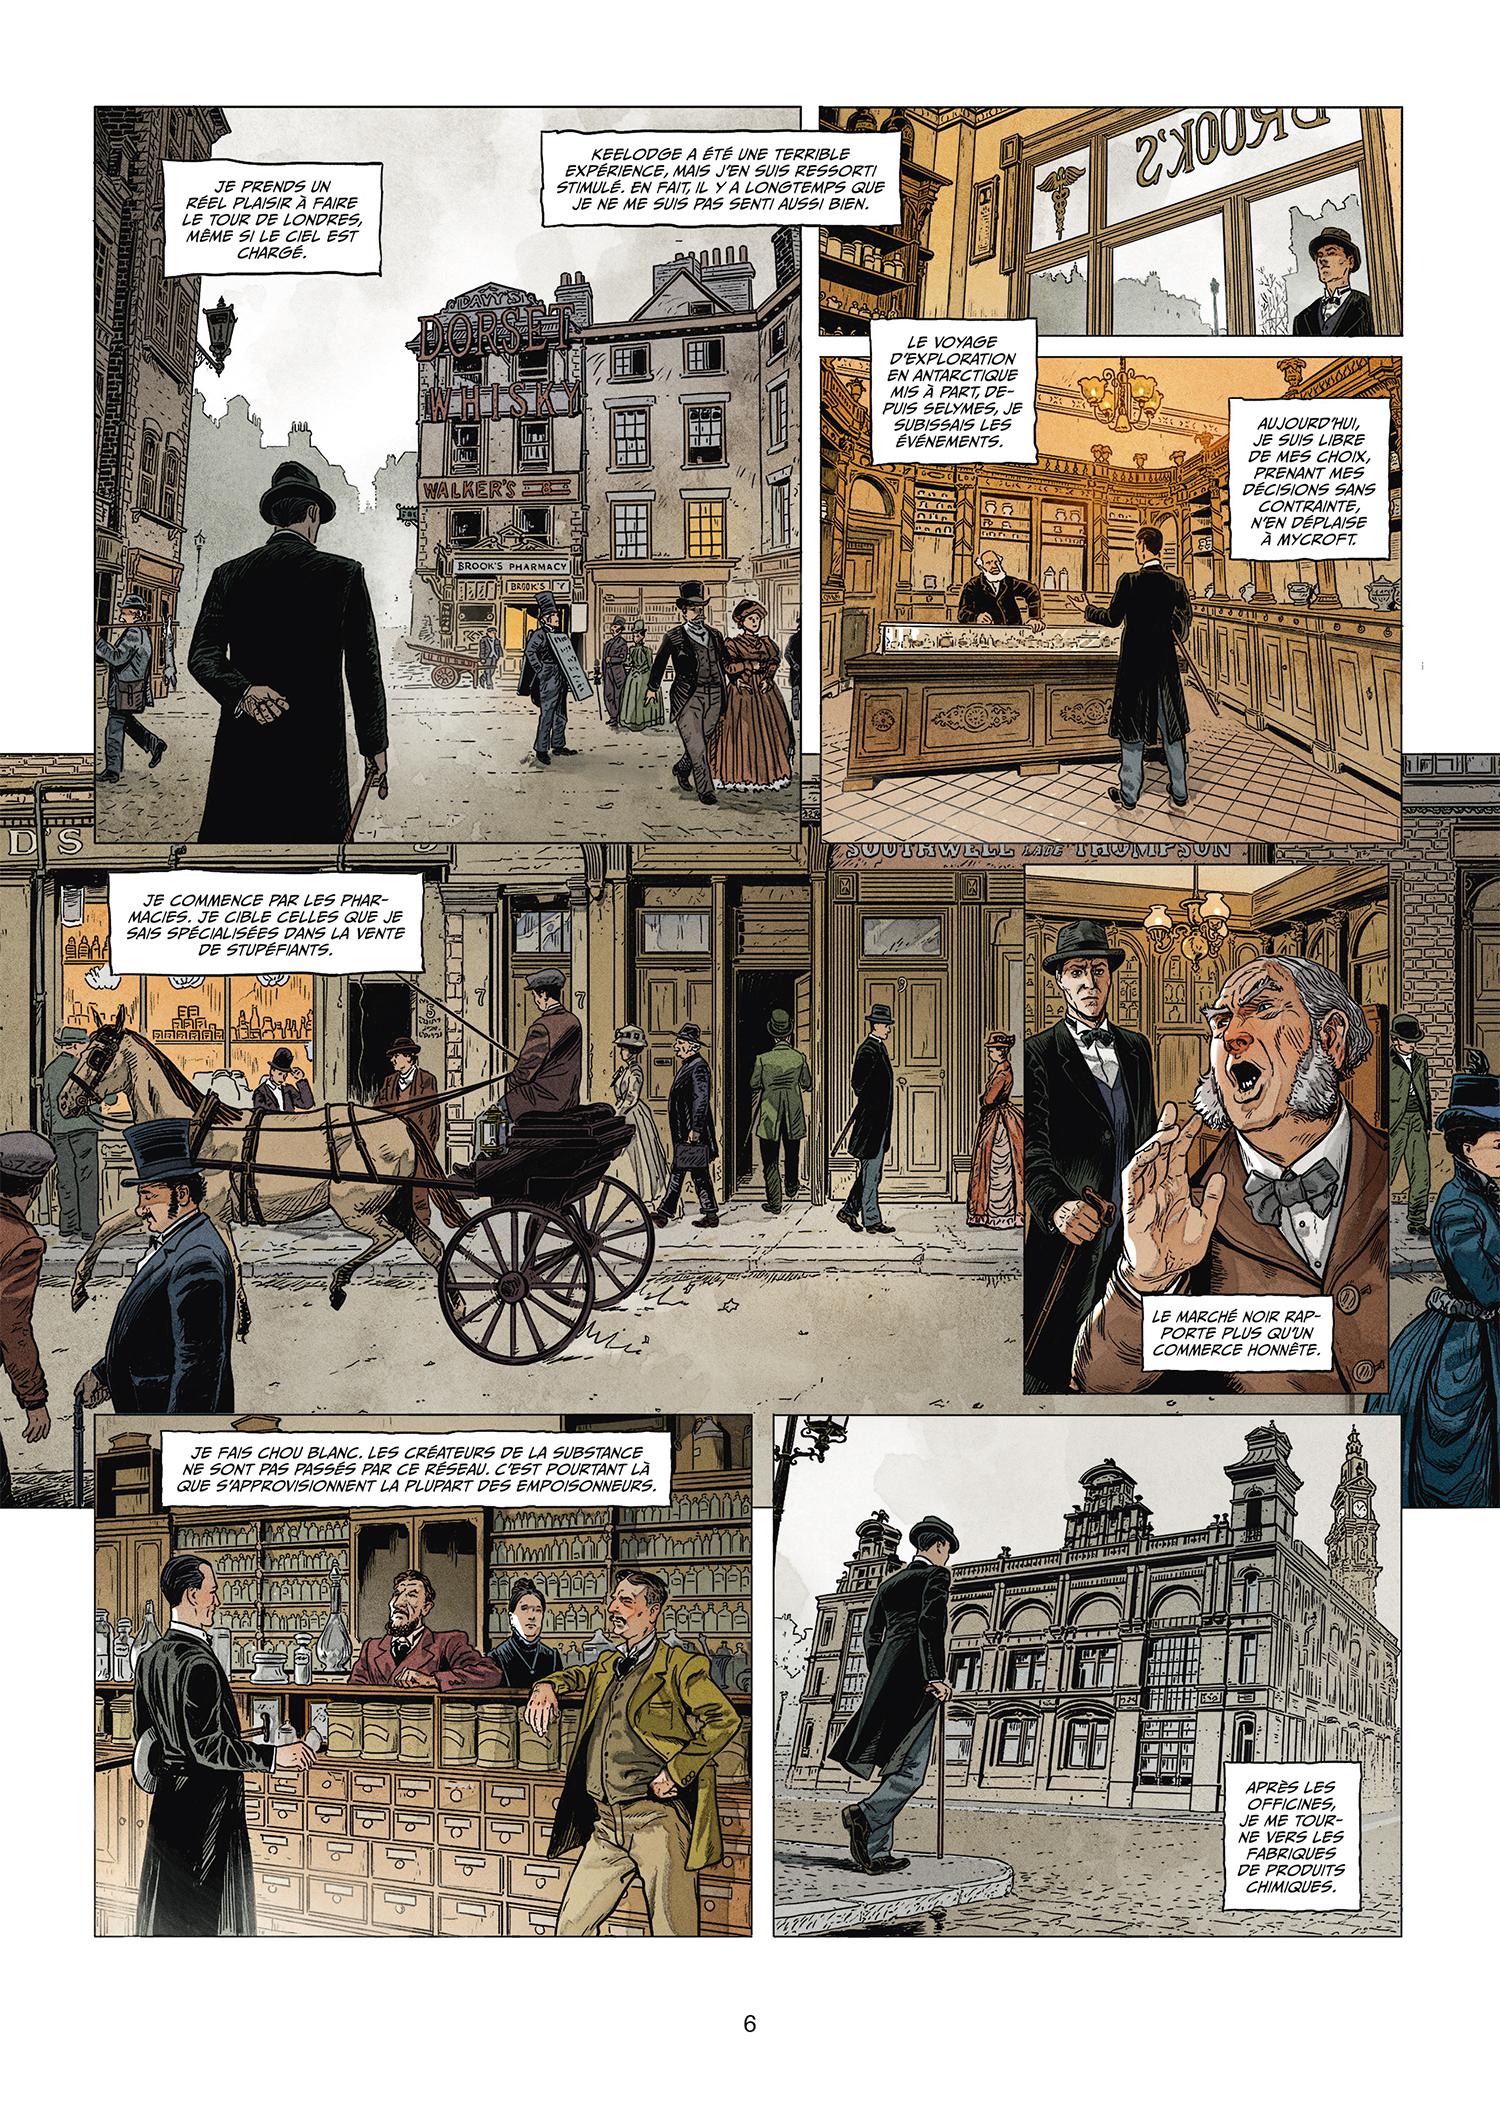 Sherlock SocietyT2.indd